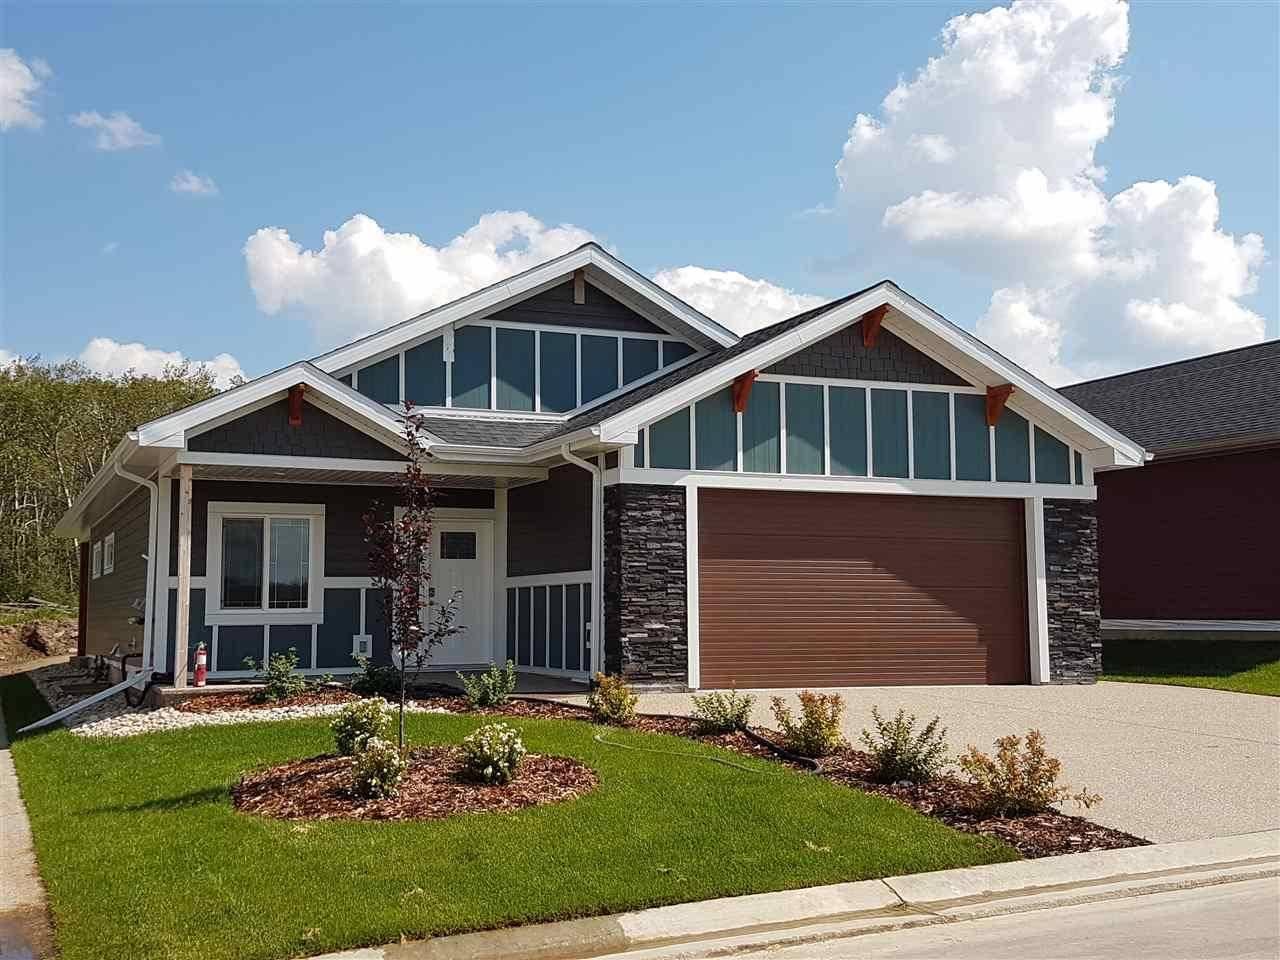 House for sale at 46504 Twp Rd Unit 139 Rural Bonnyville M.d. Alberta - MLS: E4024534